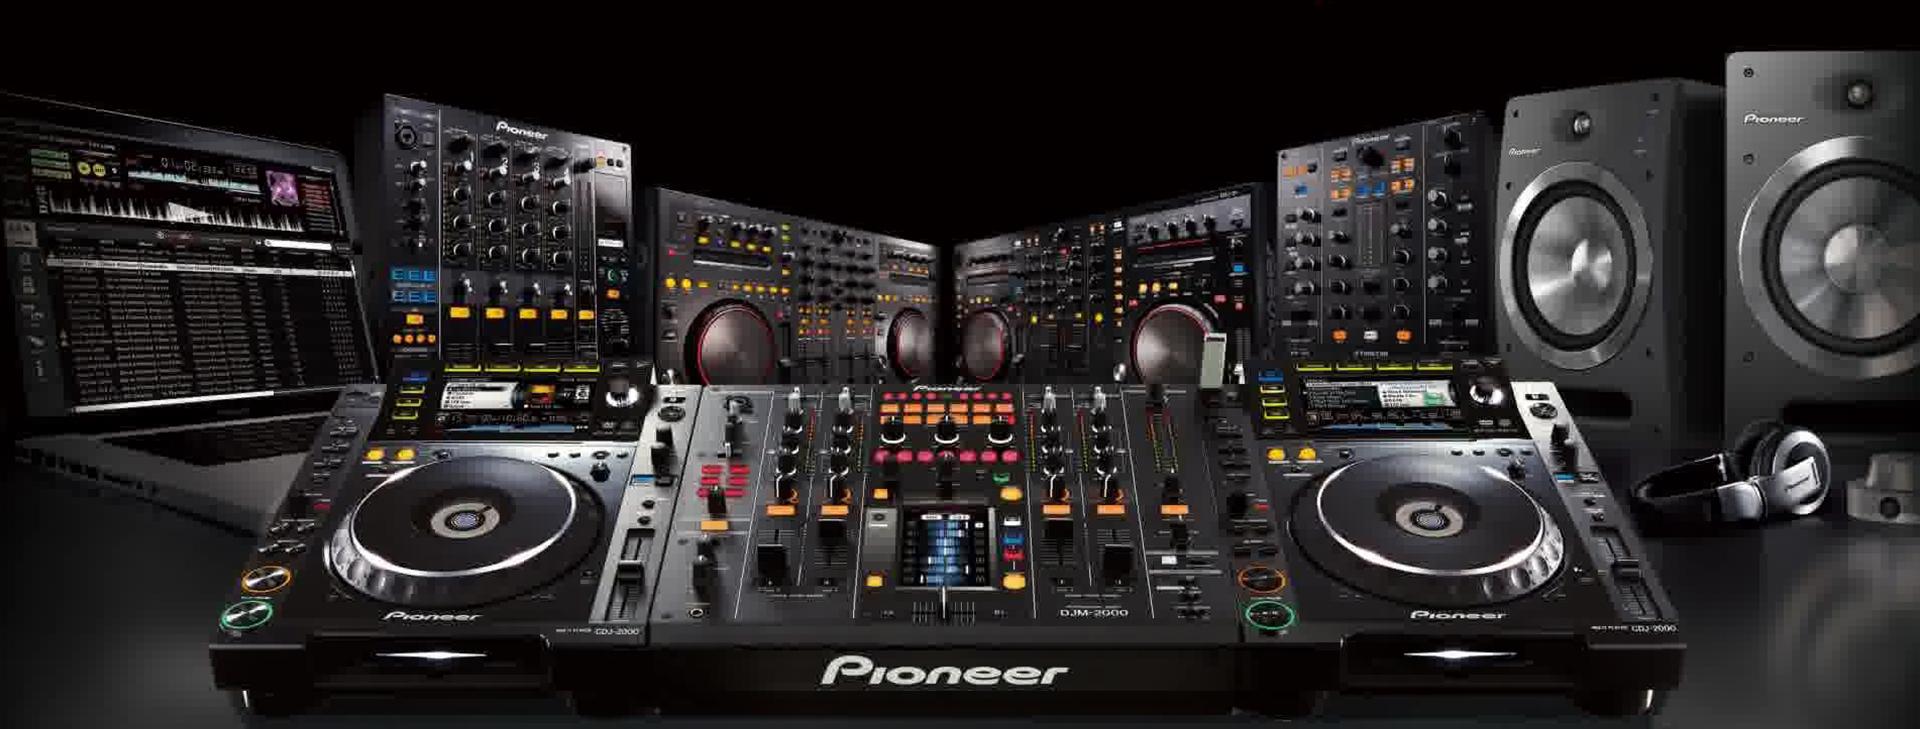 Âm thanh Pro 004